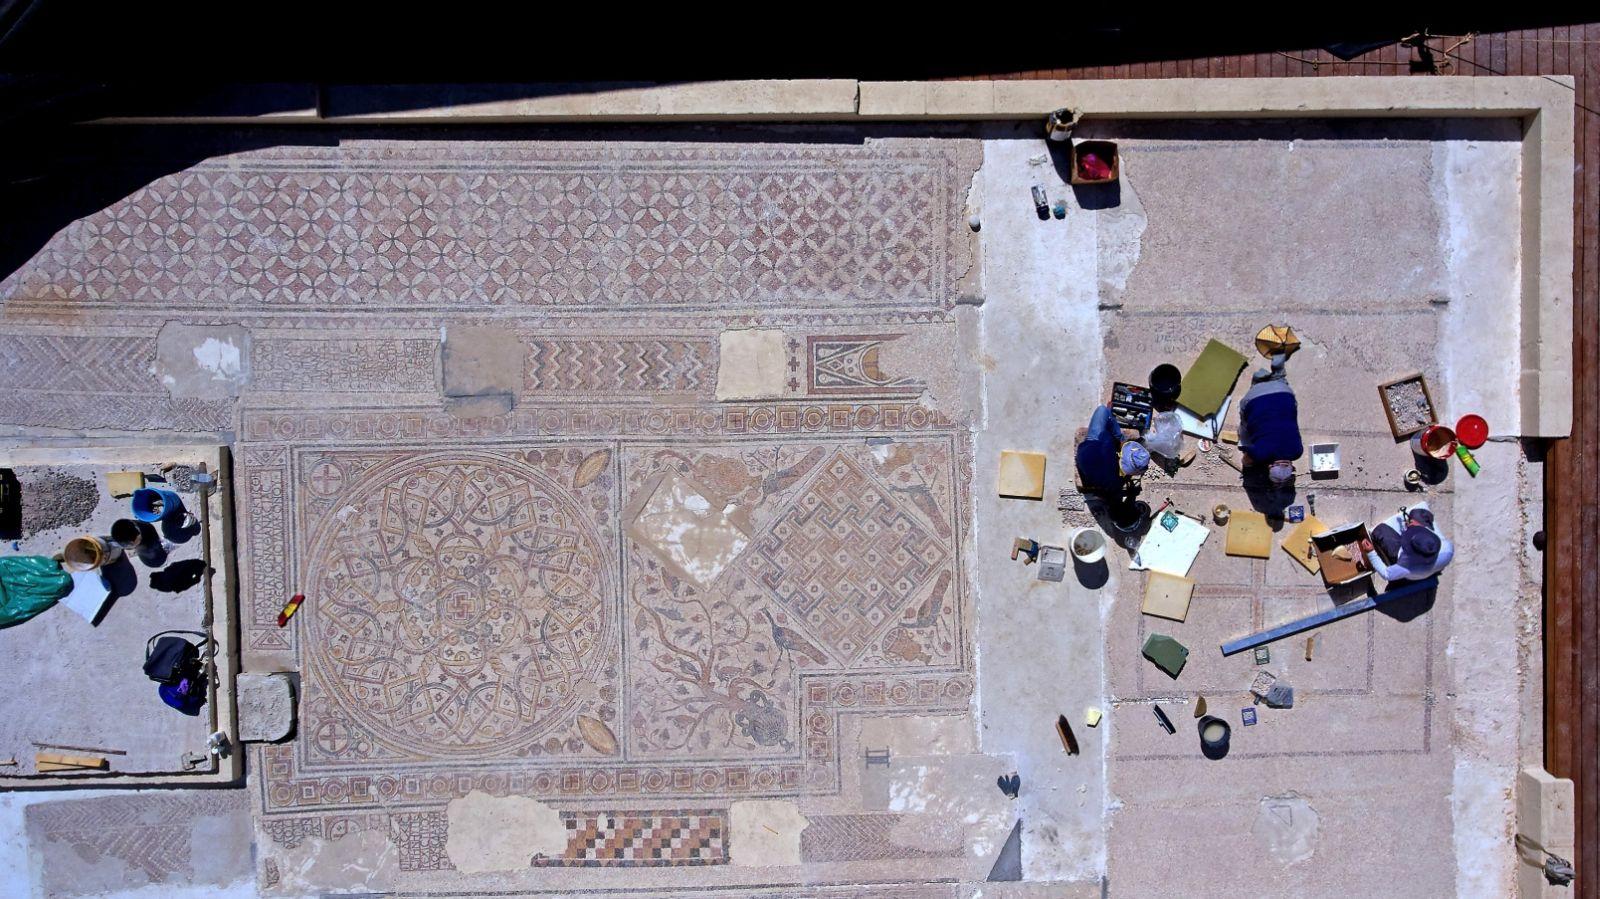 Mosaics on the roof of the IAA National Campus. Photo by Ardon Bar-Hama